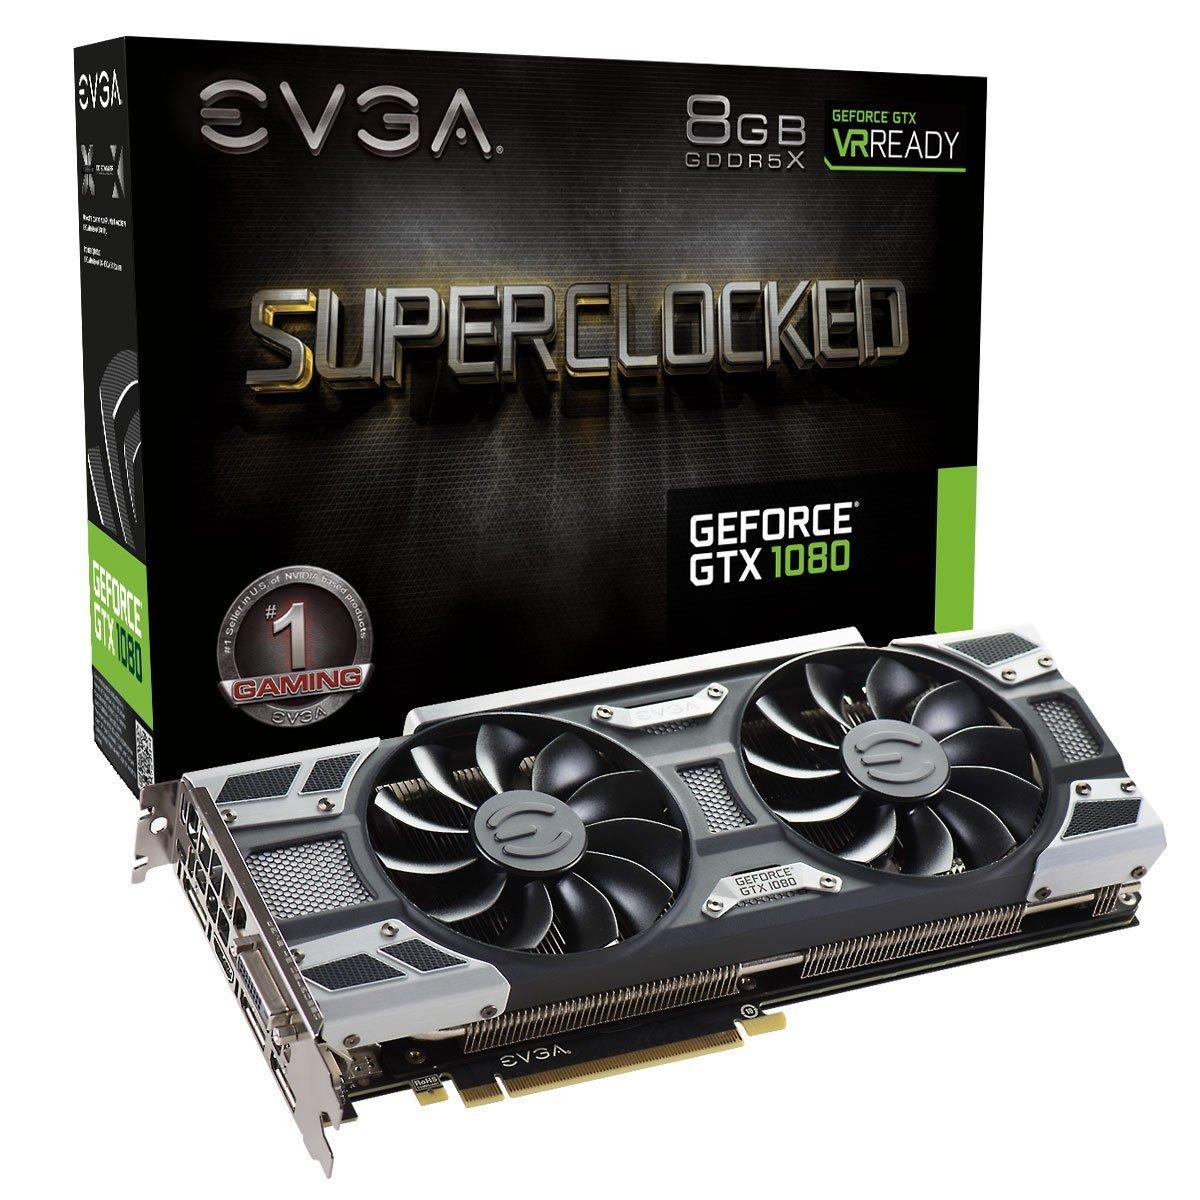 EVGA GeForce GTX 1080 SC GAMING ACX 3.0, 8GB GDDR5X, LED, DX12 OSD Support (PXOC) Graphics Card 08G-P4-6183-KR $469.99